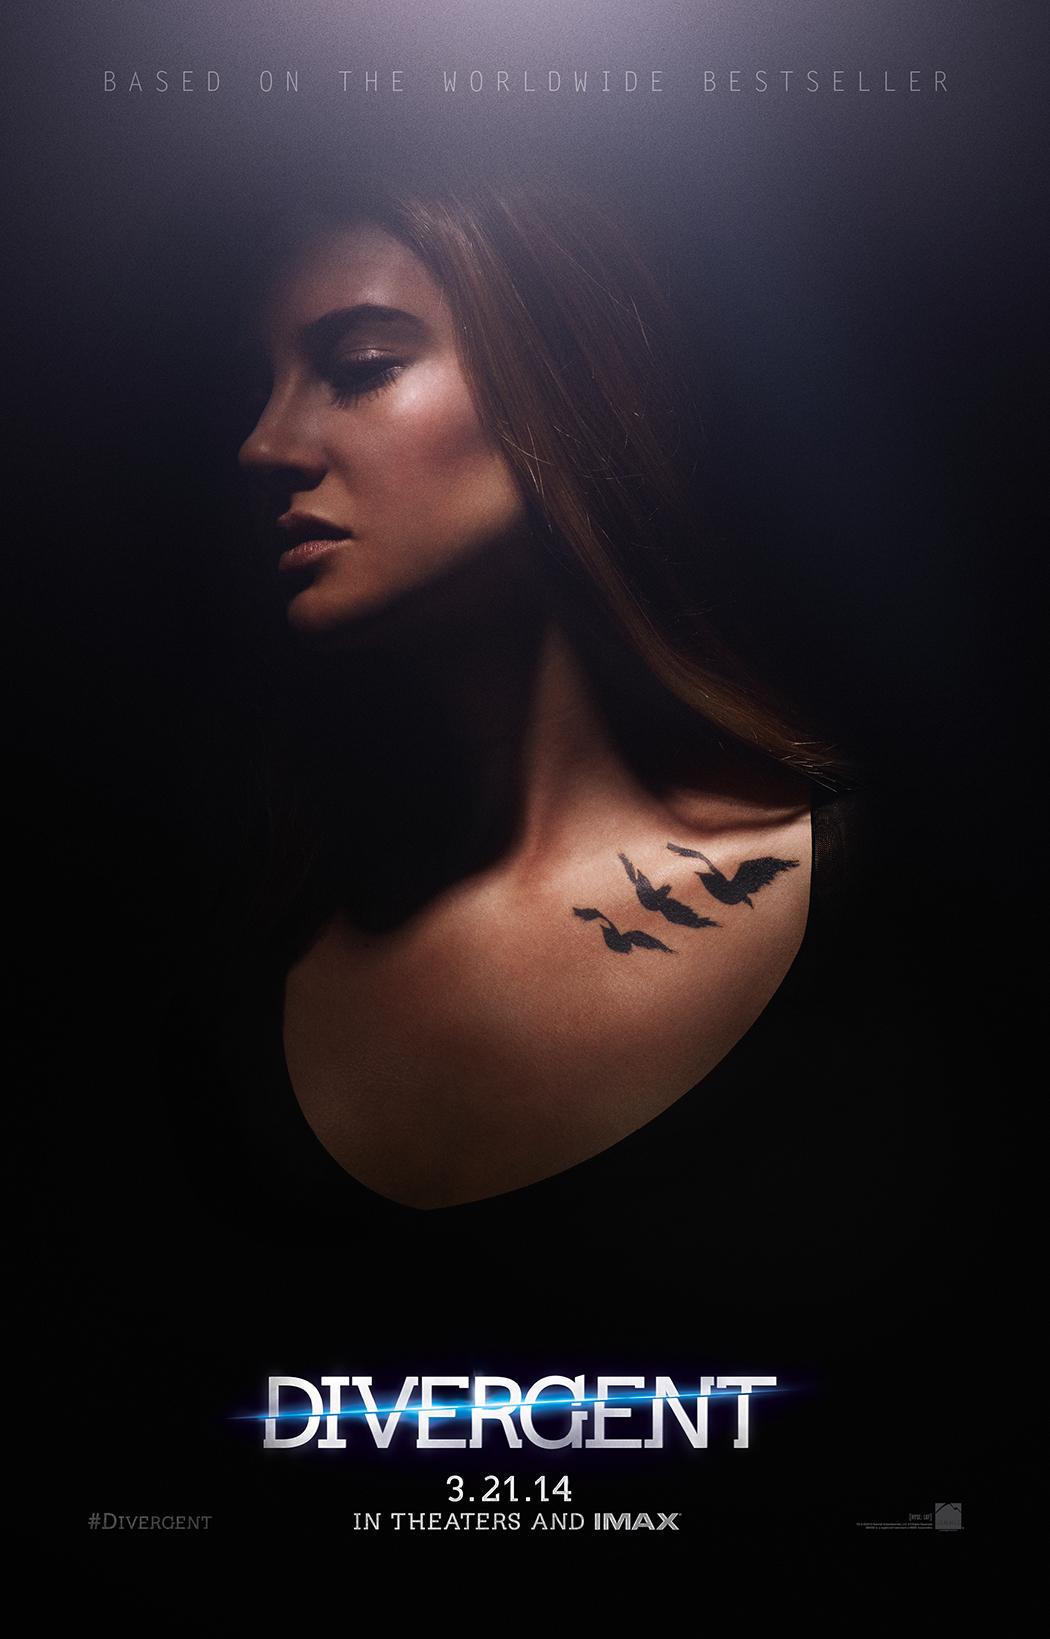 Shailene Woodley as Tris